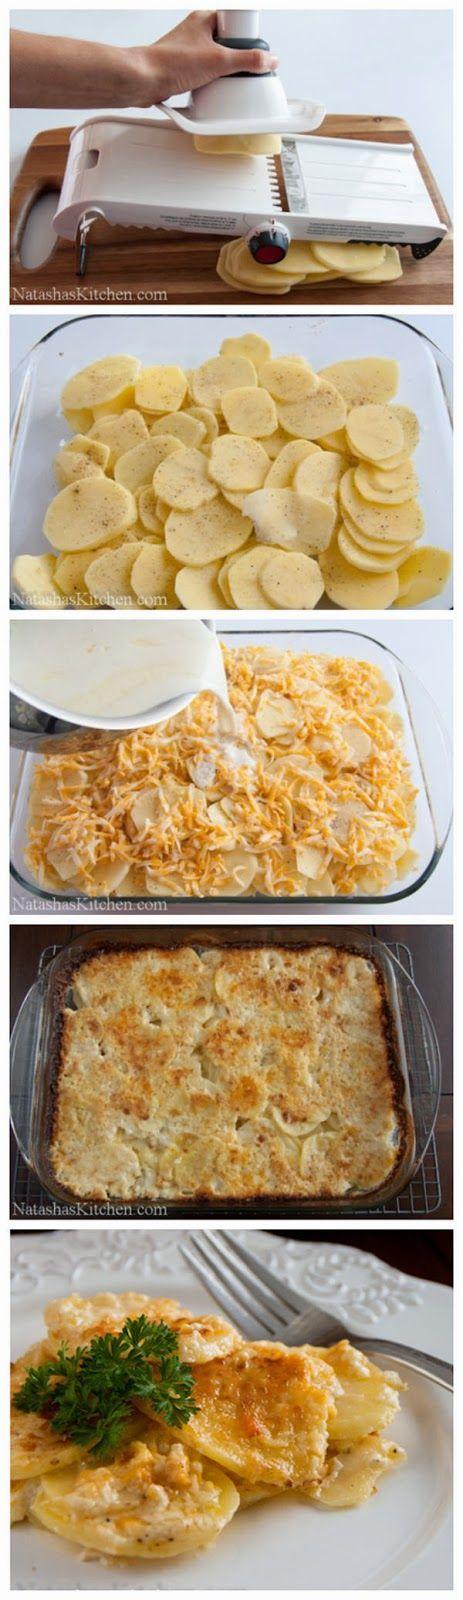 Scalloped Potatoes Recipe: